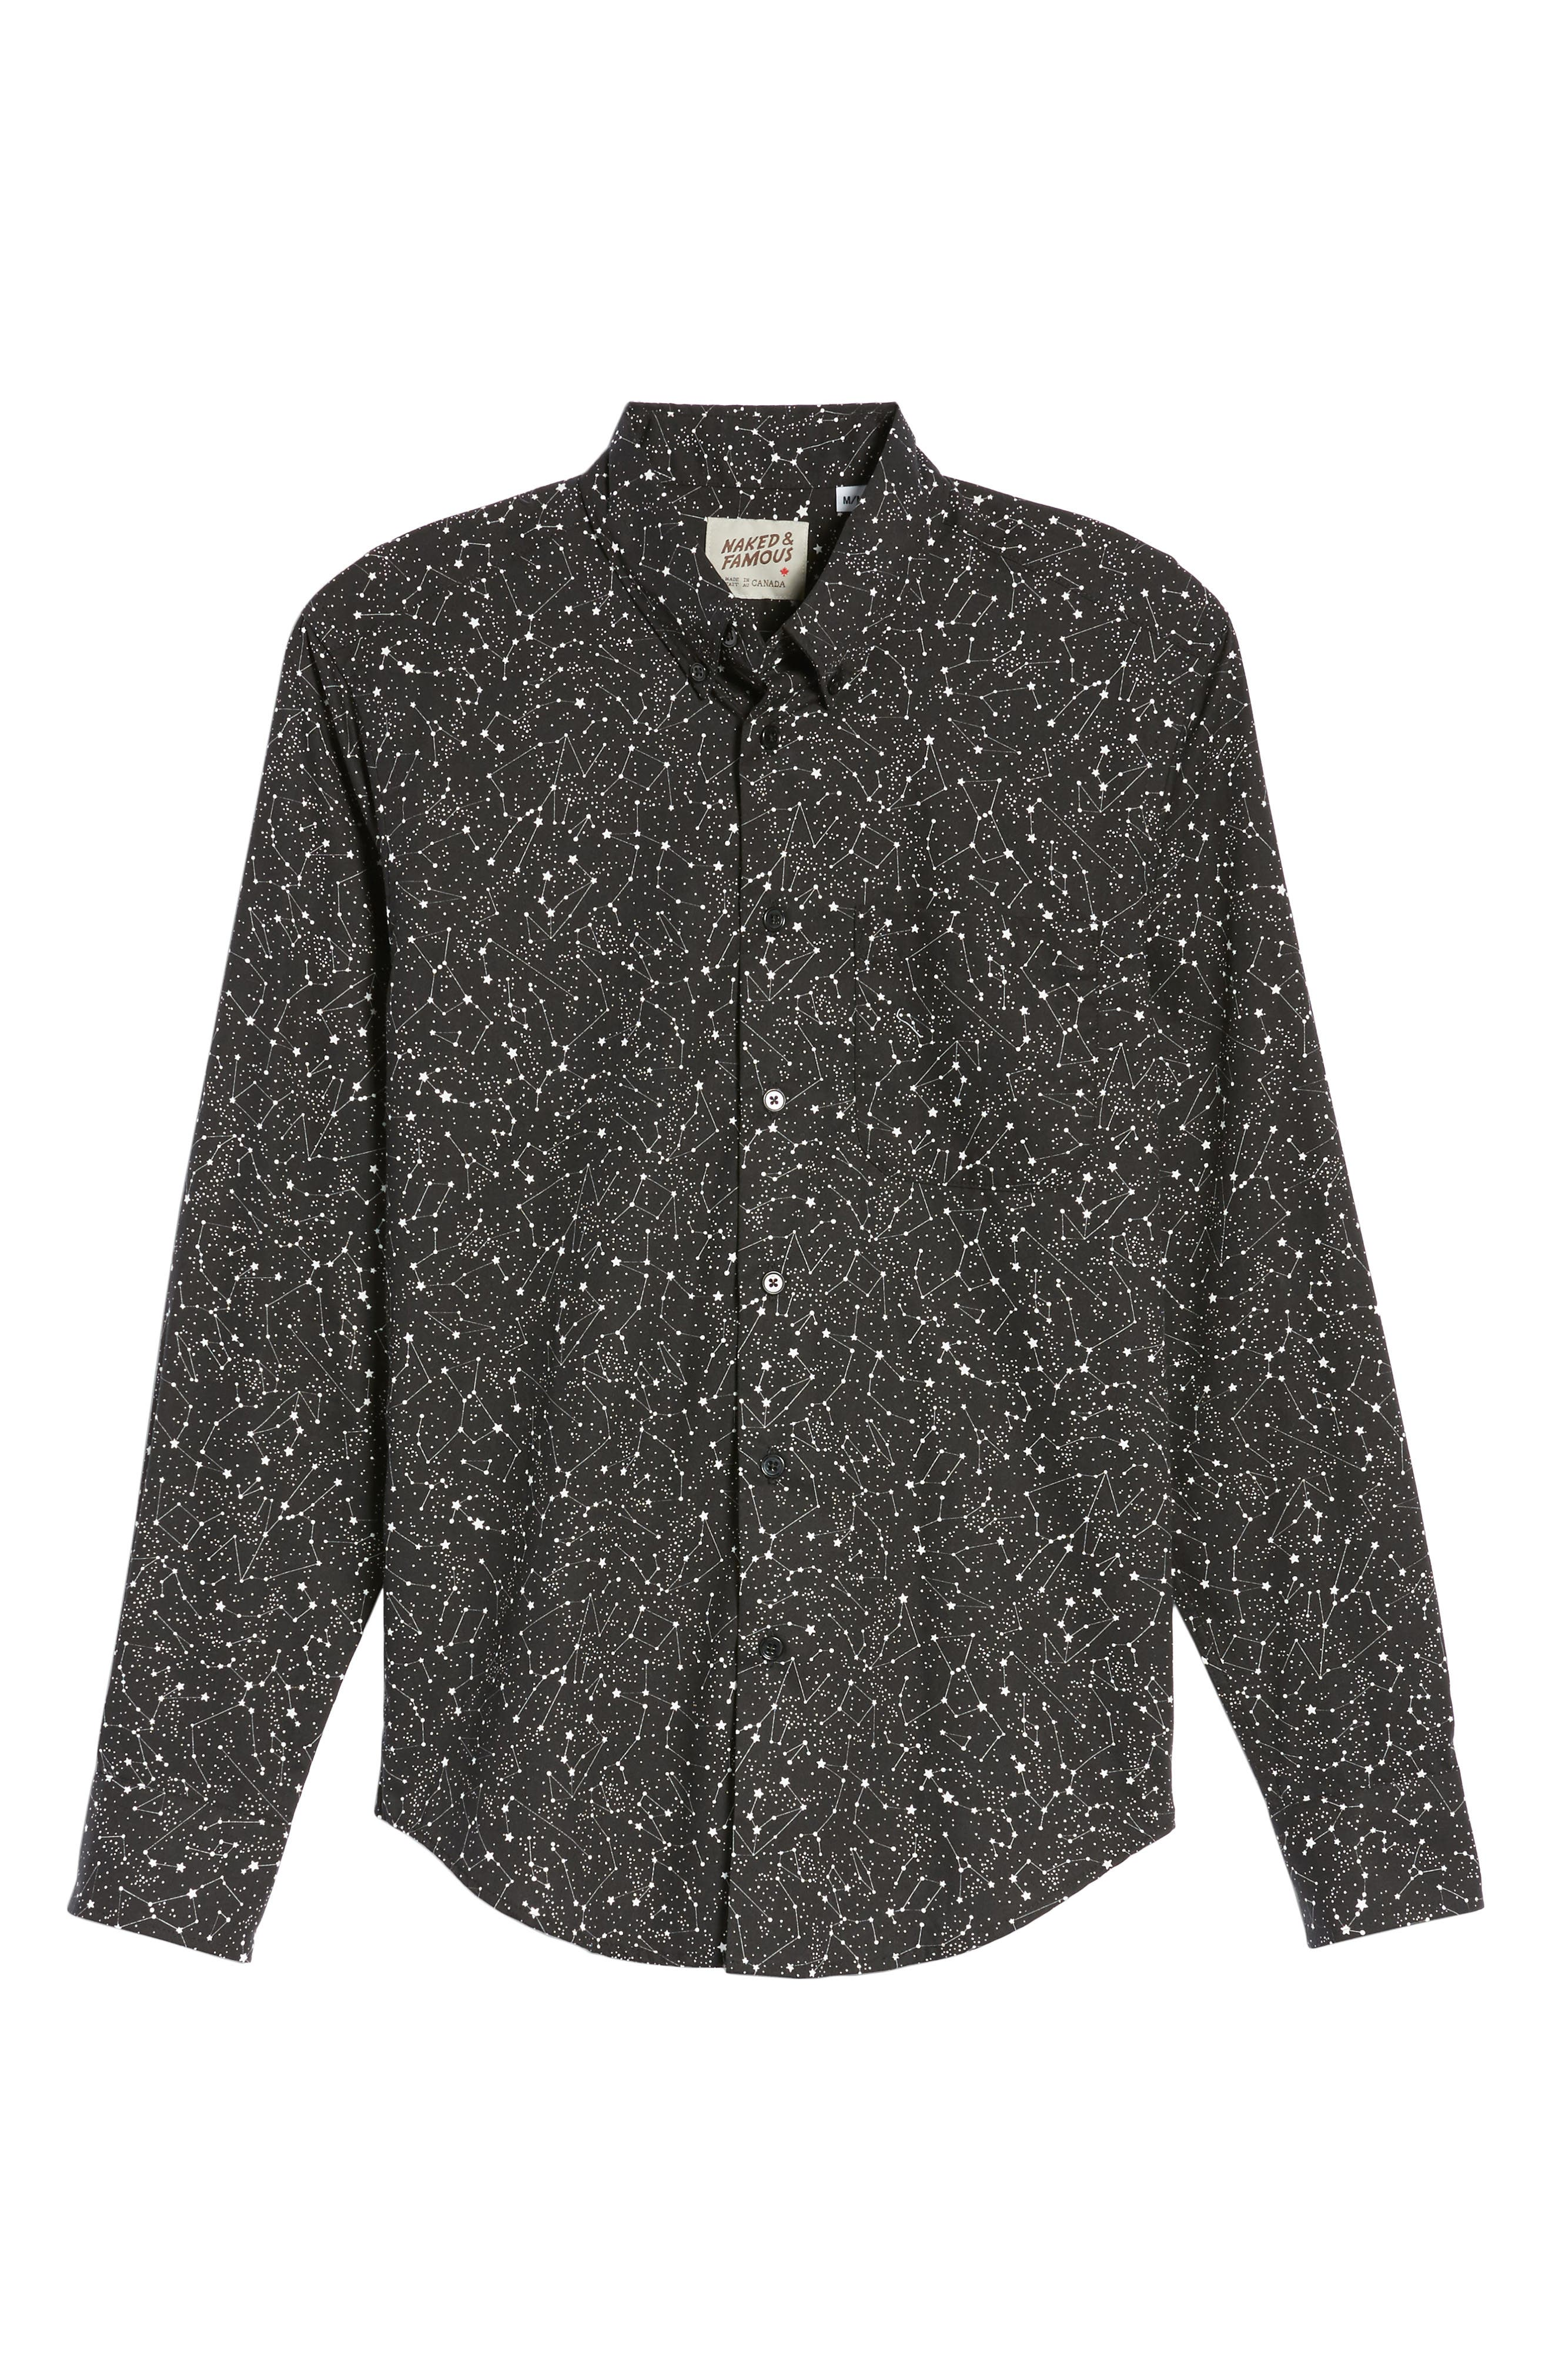 Constellations Shirt,                             Alternate thumbnail 6, color,                             Black